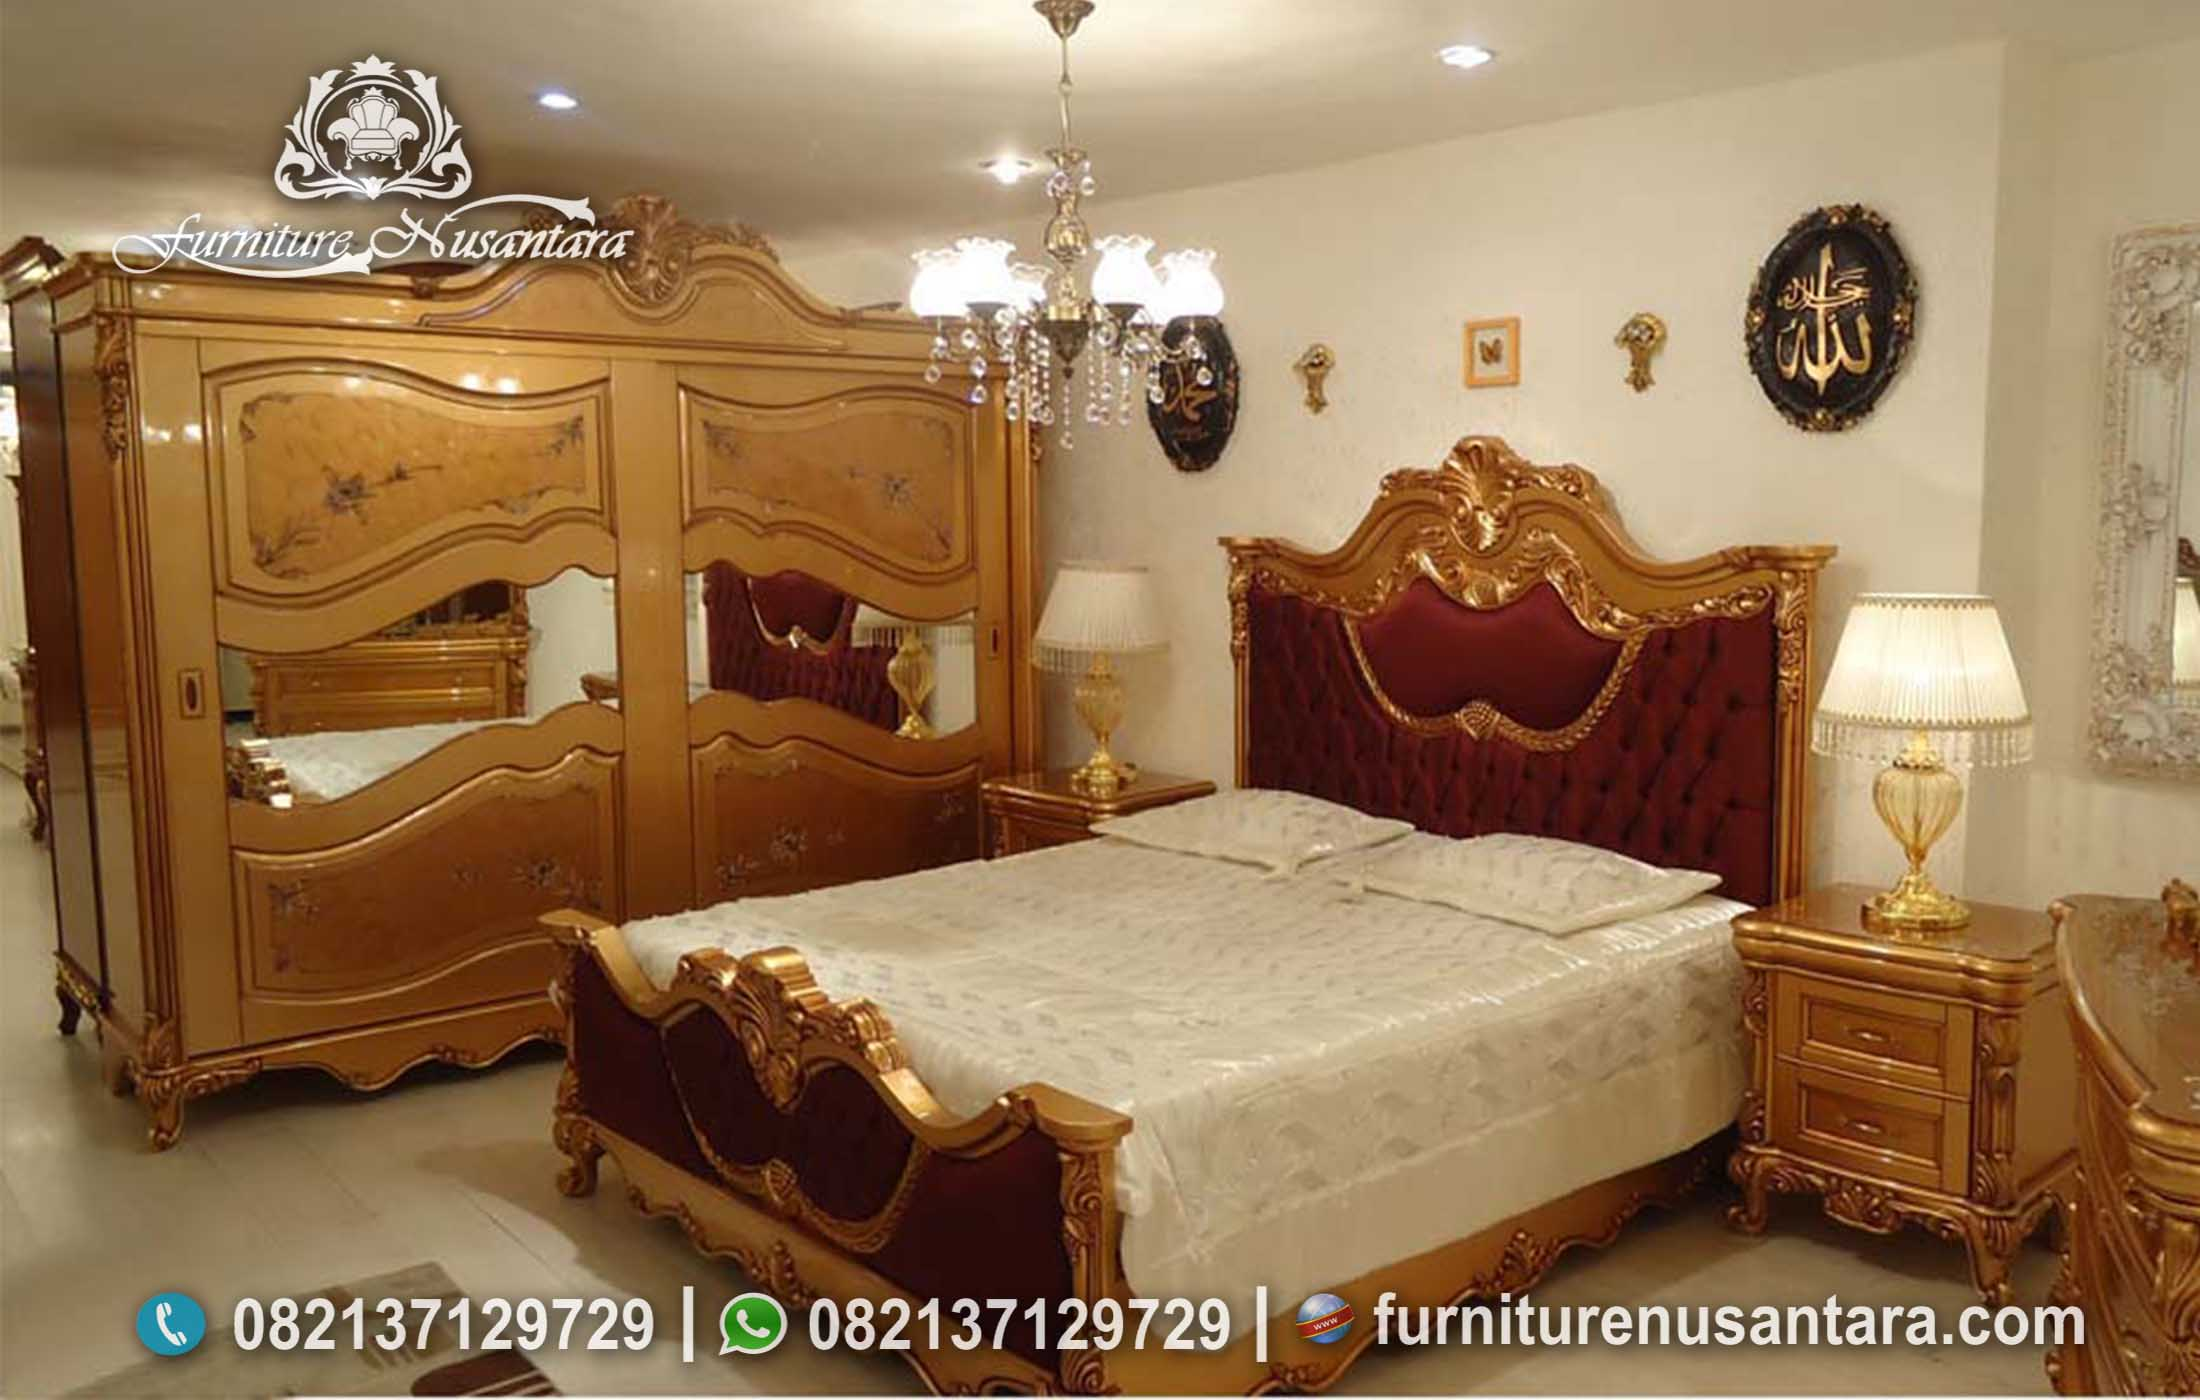 Kamar Tidur Merah Maroon Mewah KS-133, Furniture Nusantara